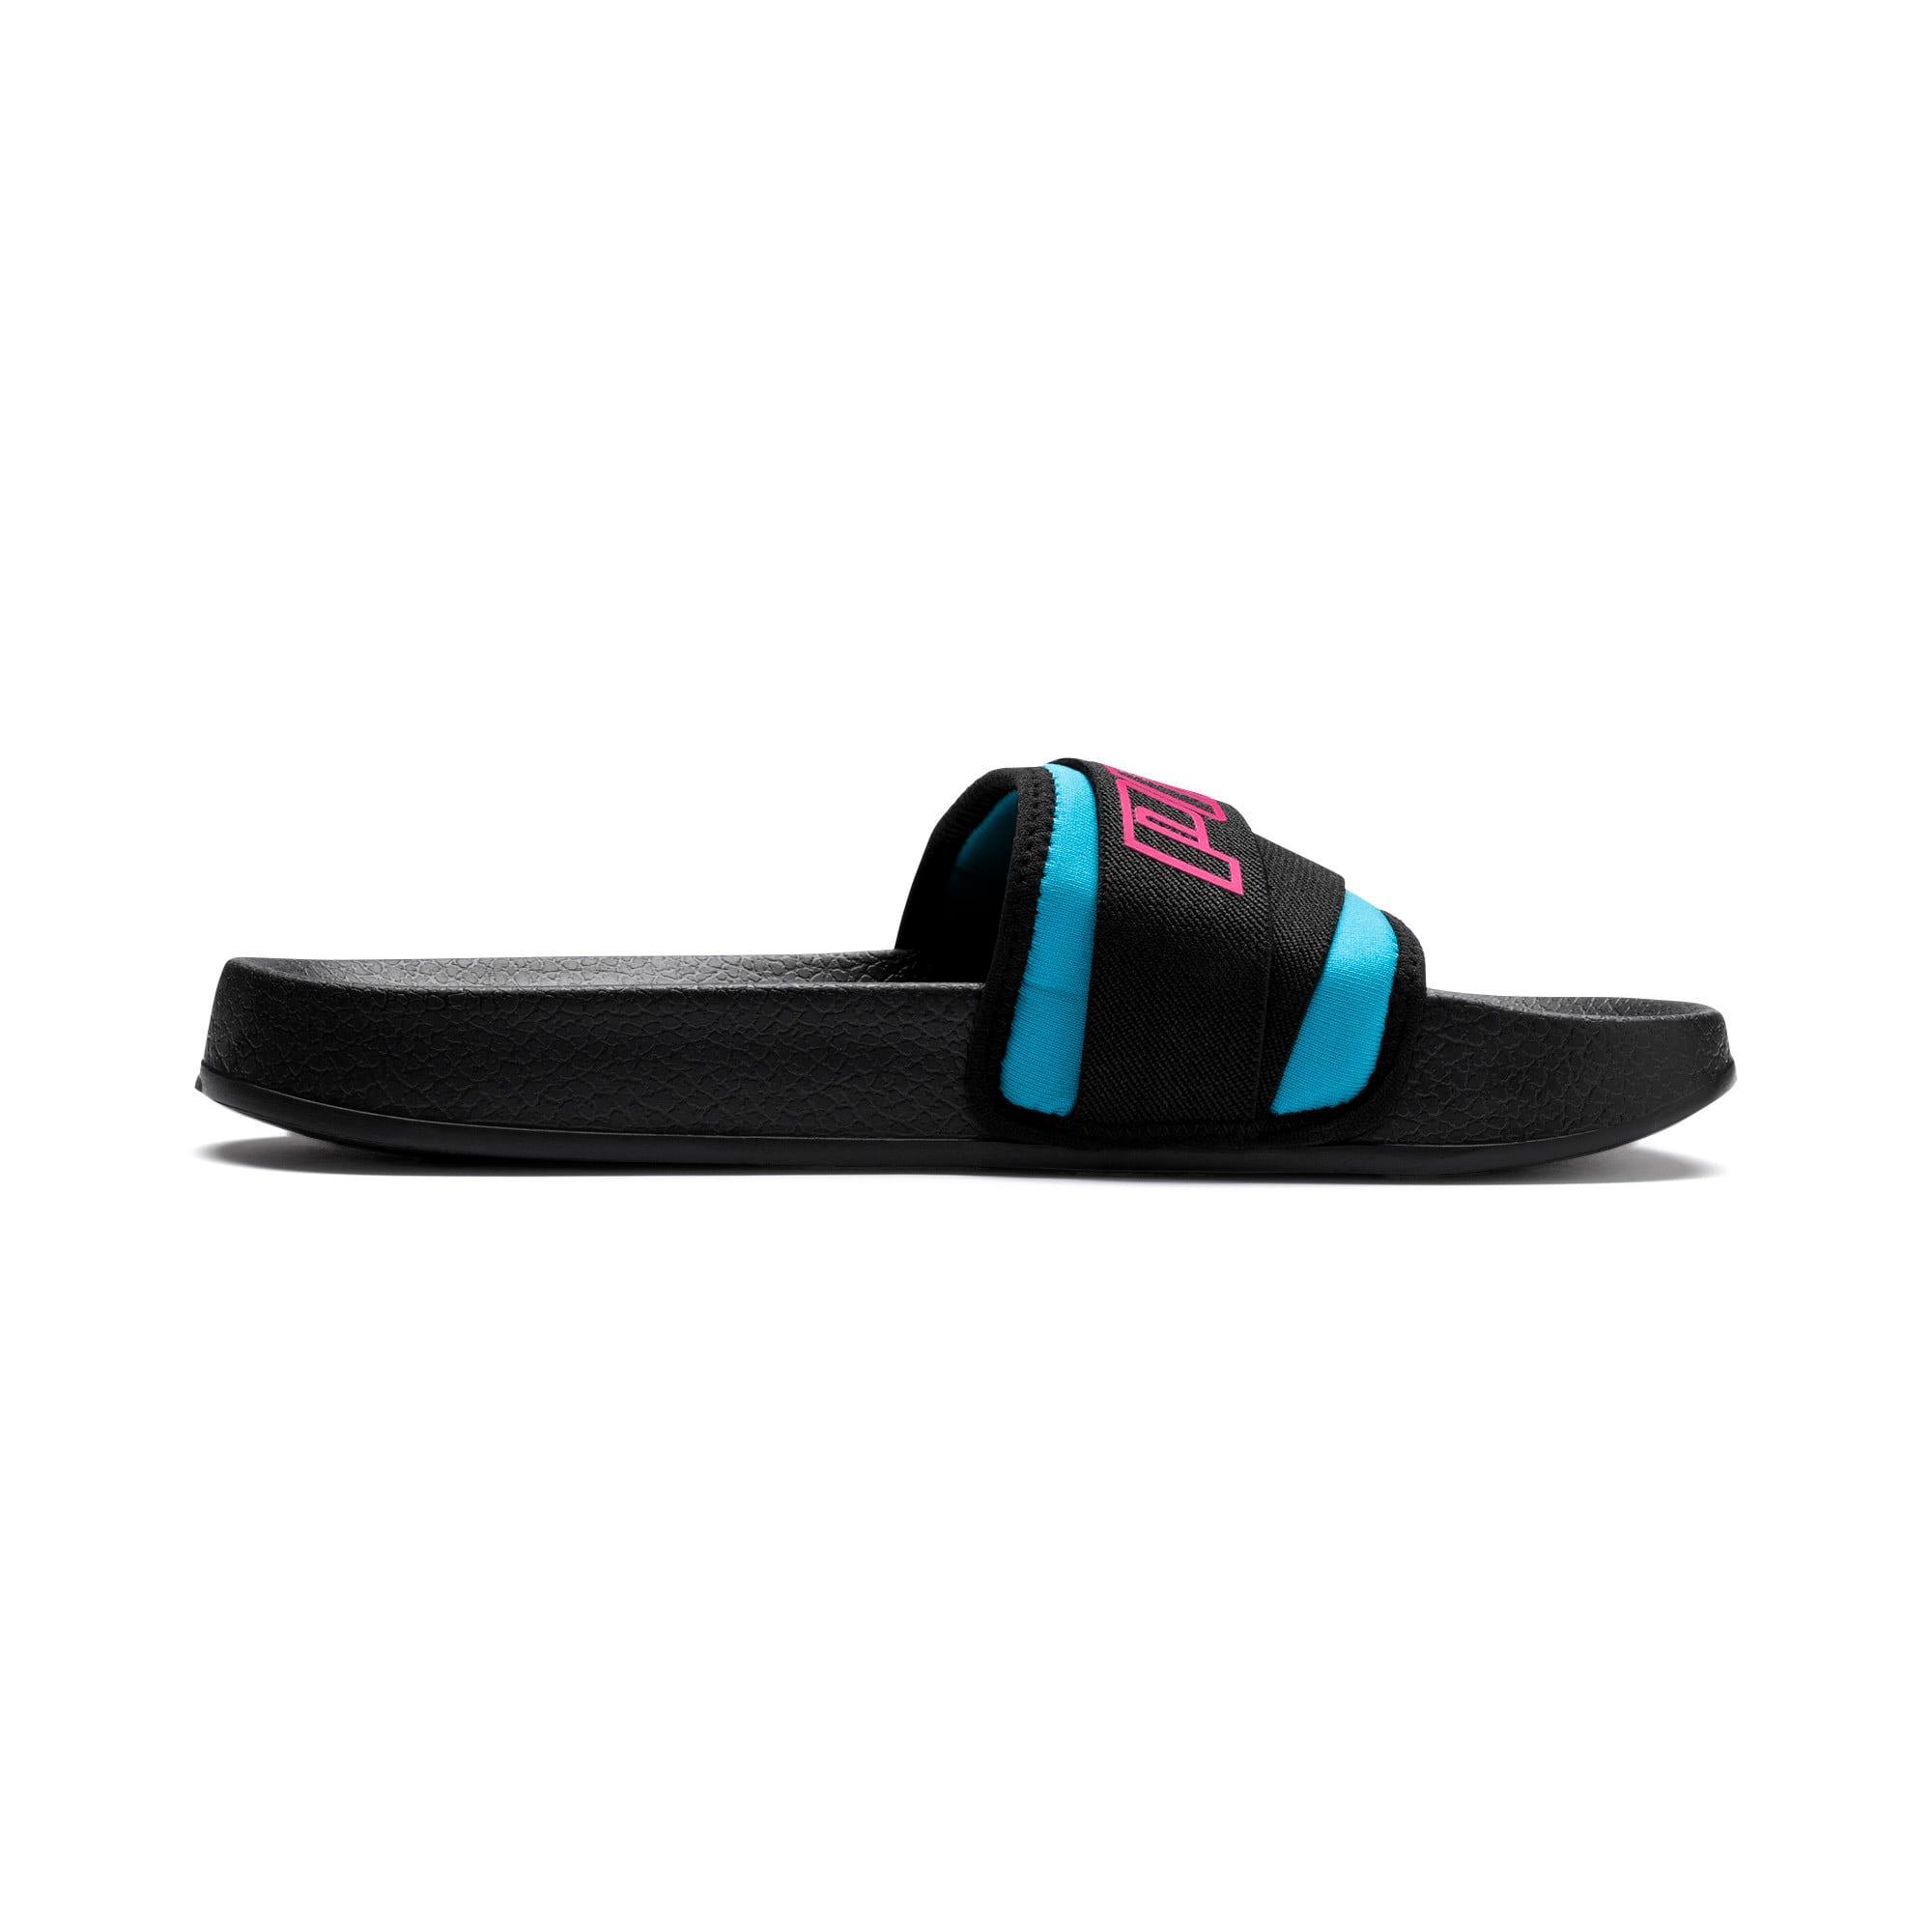 Thumbnail 5 of Leadcat Trailblazer Slide Women's Sandals, Puma Black-Fuchsia Purple, medium